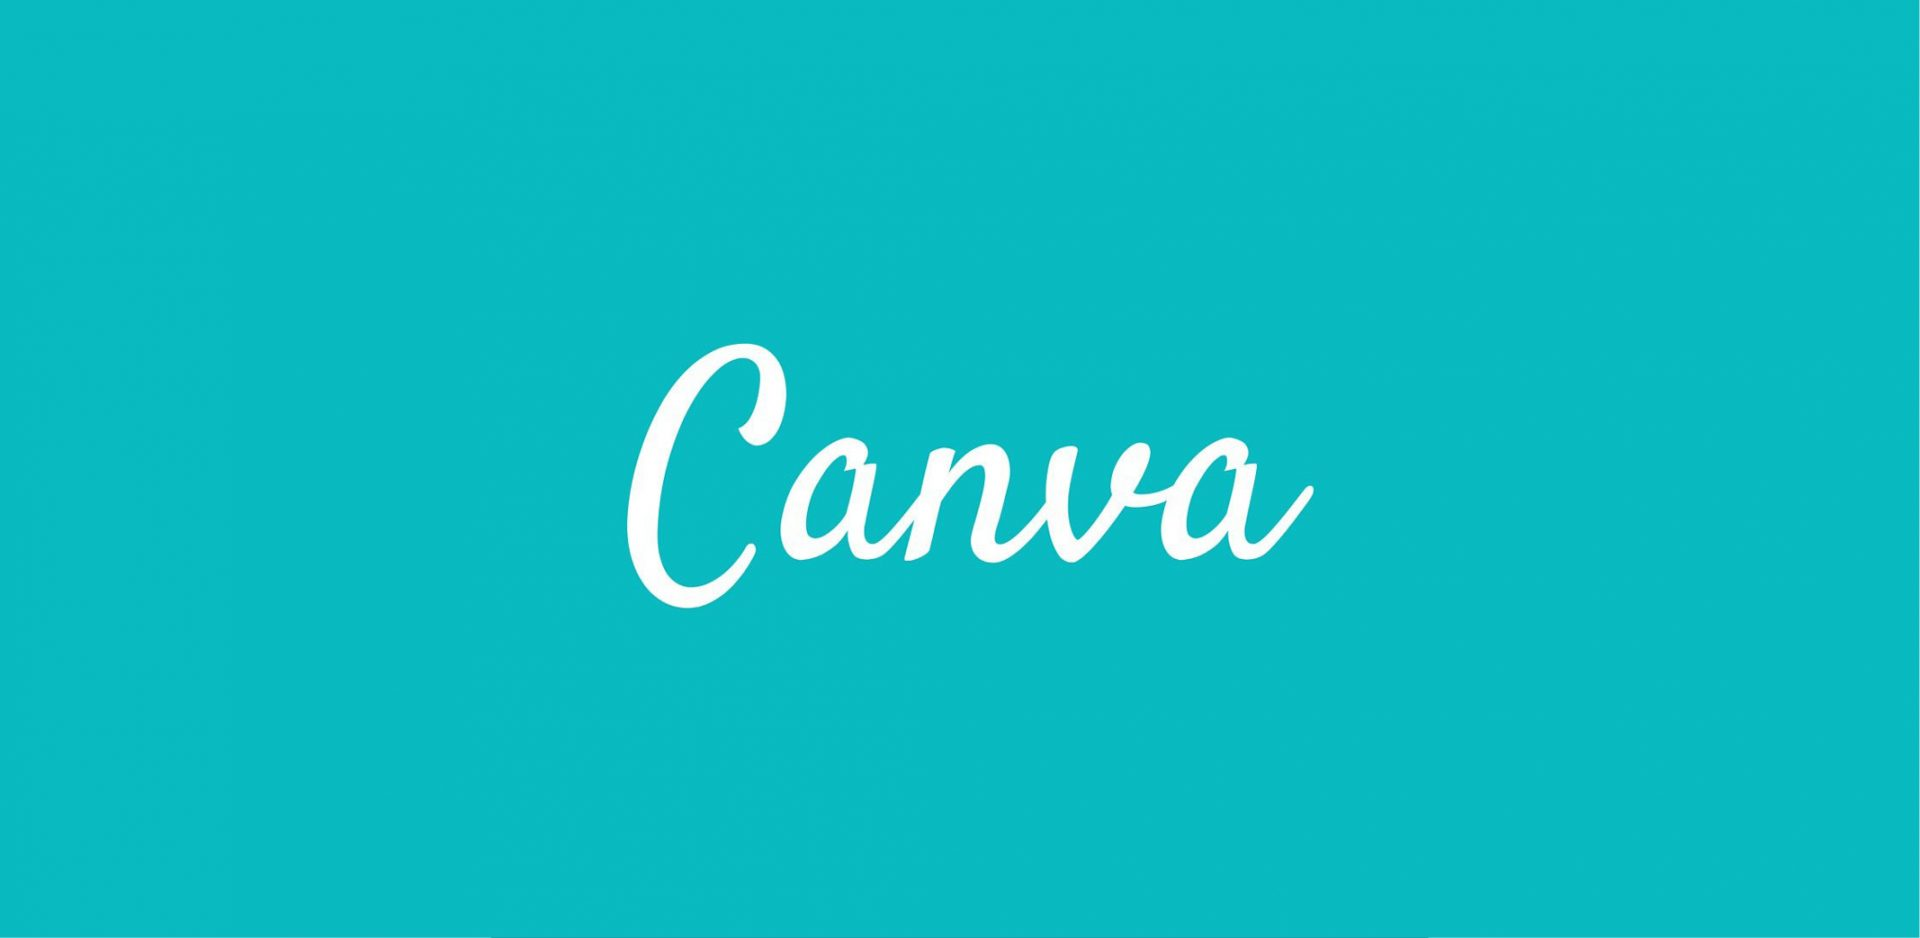 Formation en graphisme avec Canva